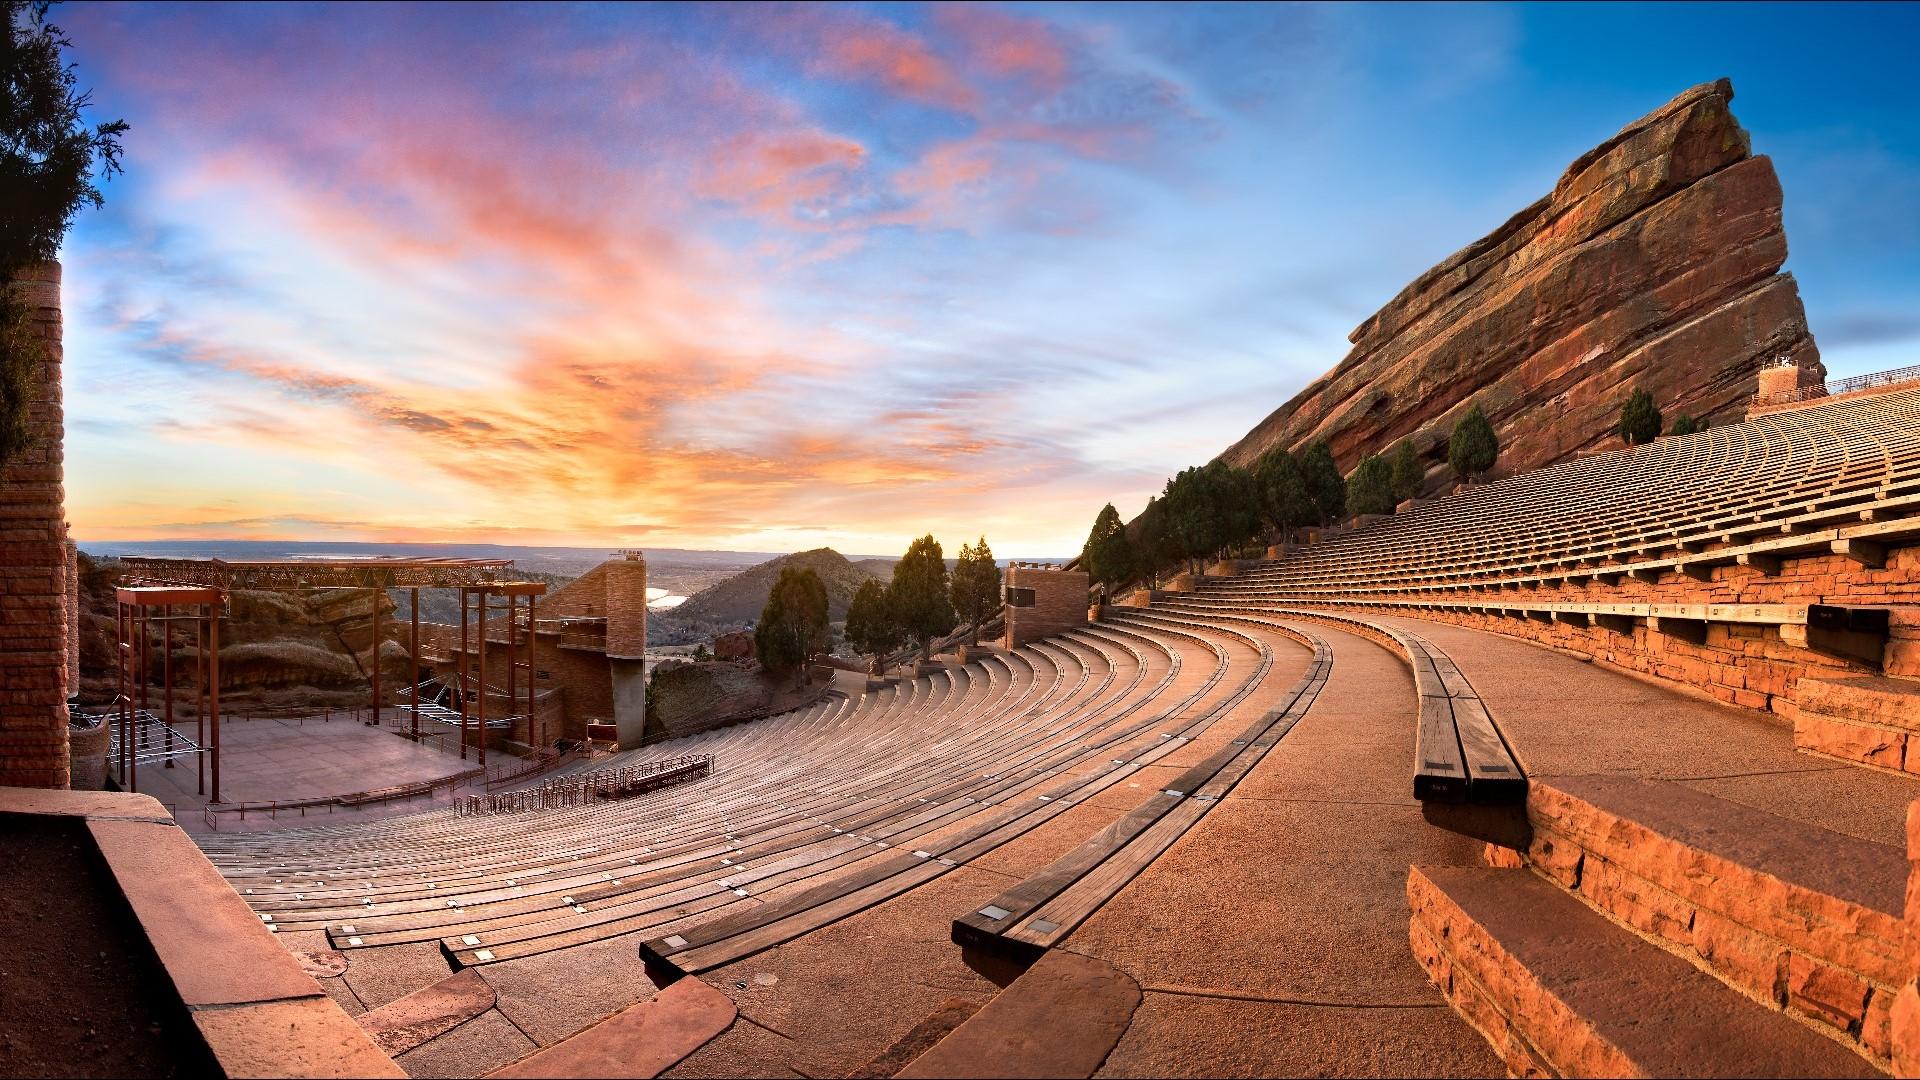 Red Rocks Amphitheatre. Morrison. Colorado, USA - Heroes